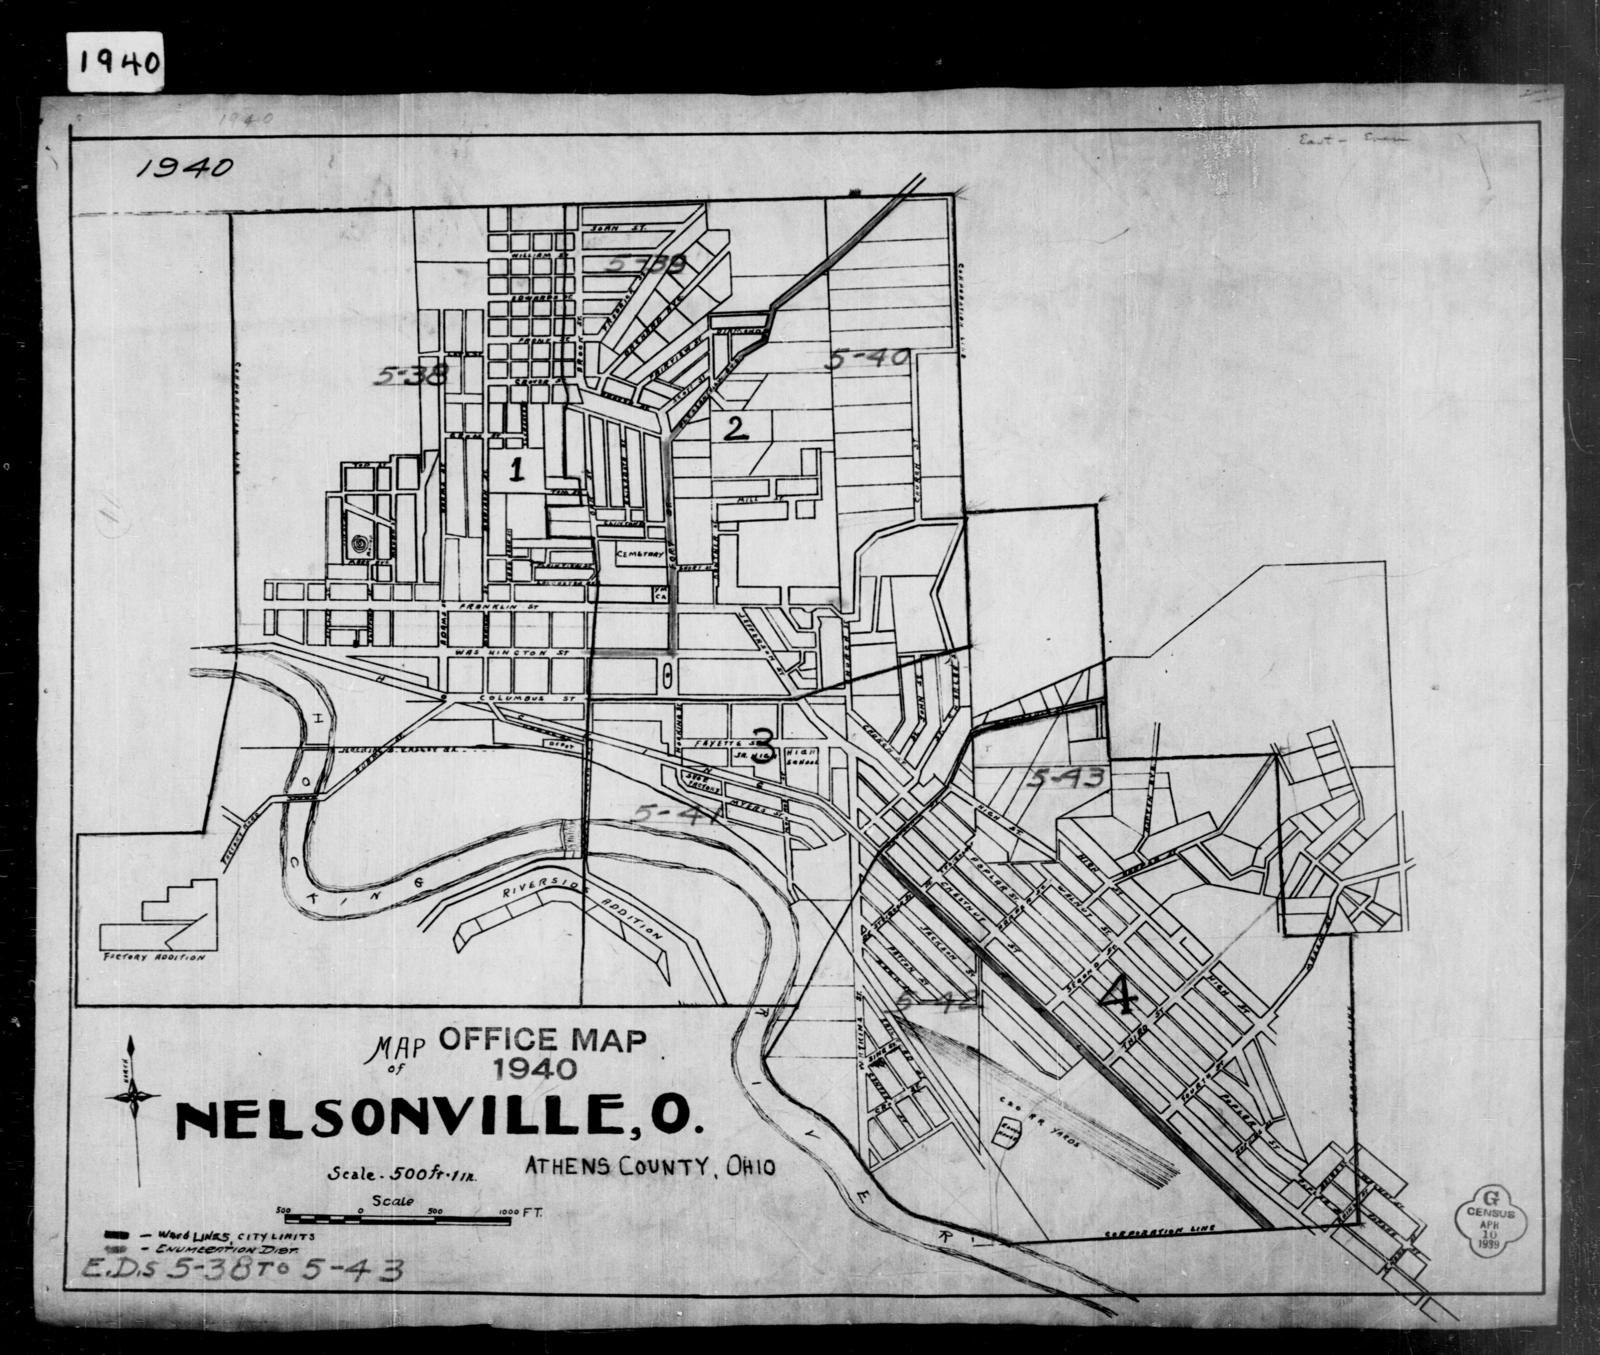 1940 Census Enumeration District Maps Ohio Athens County